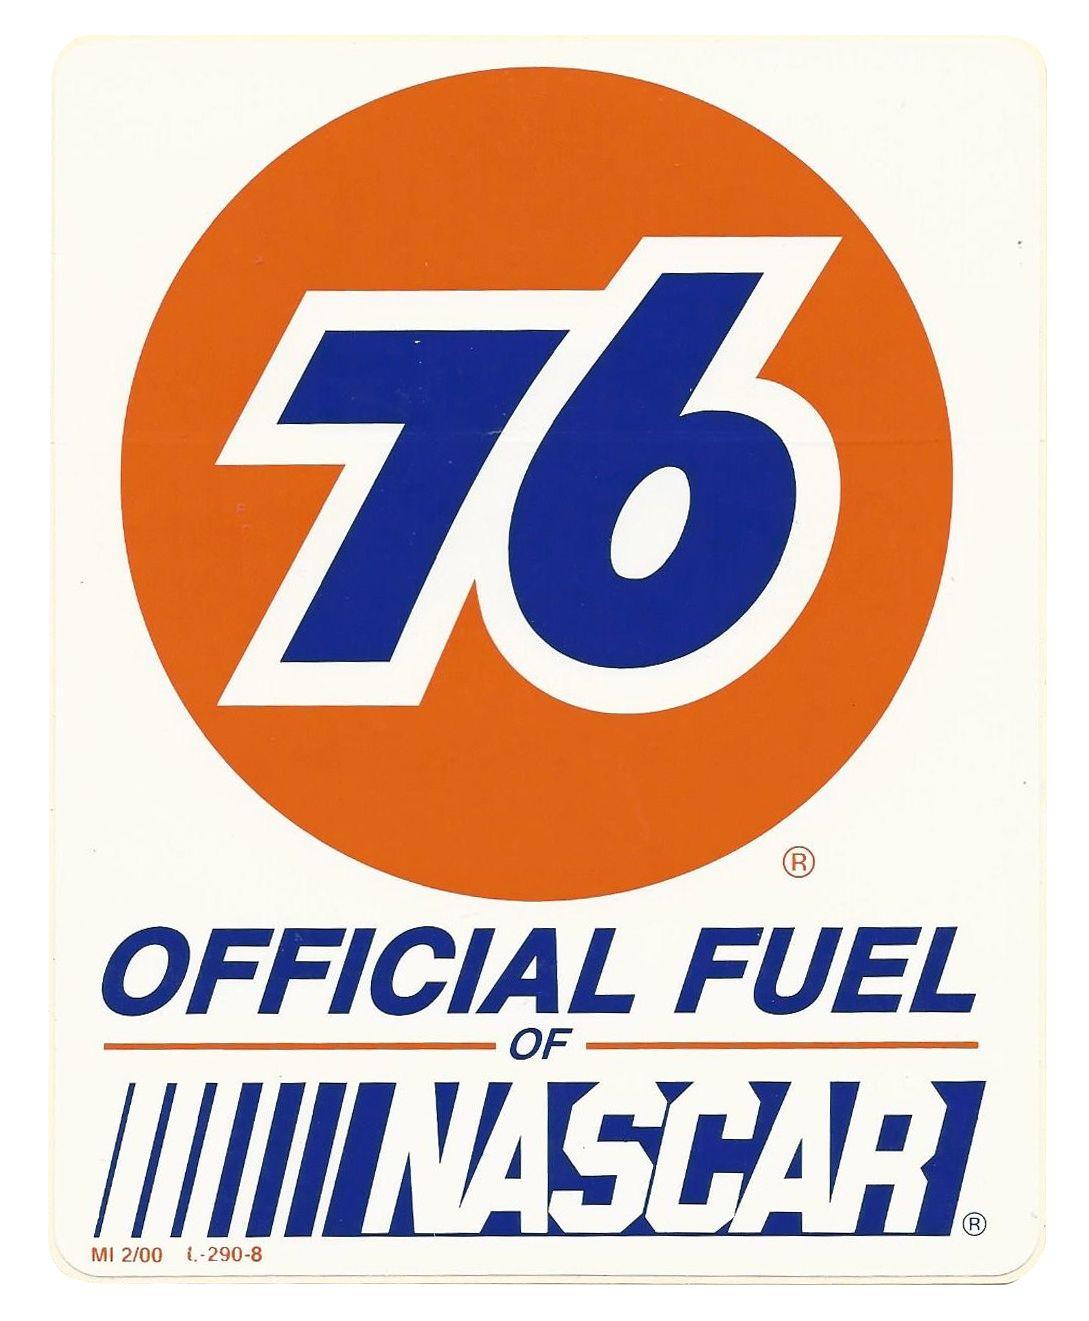 Vintage Racing Logo Decals From The 1970 S Retro Logos Vintage Logo Logos